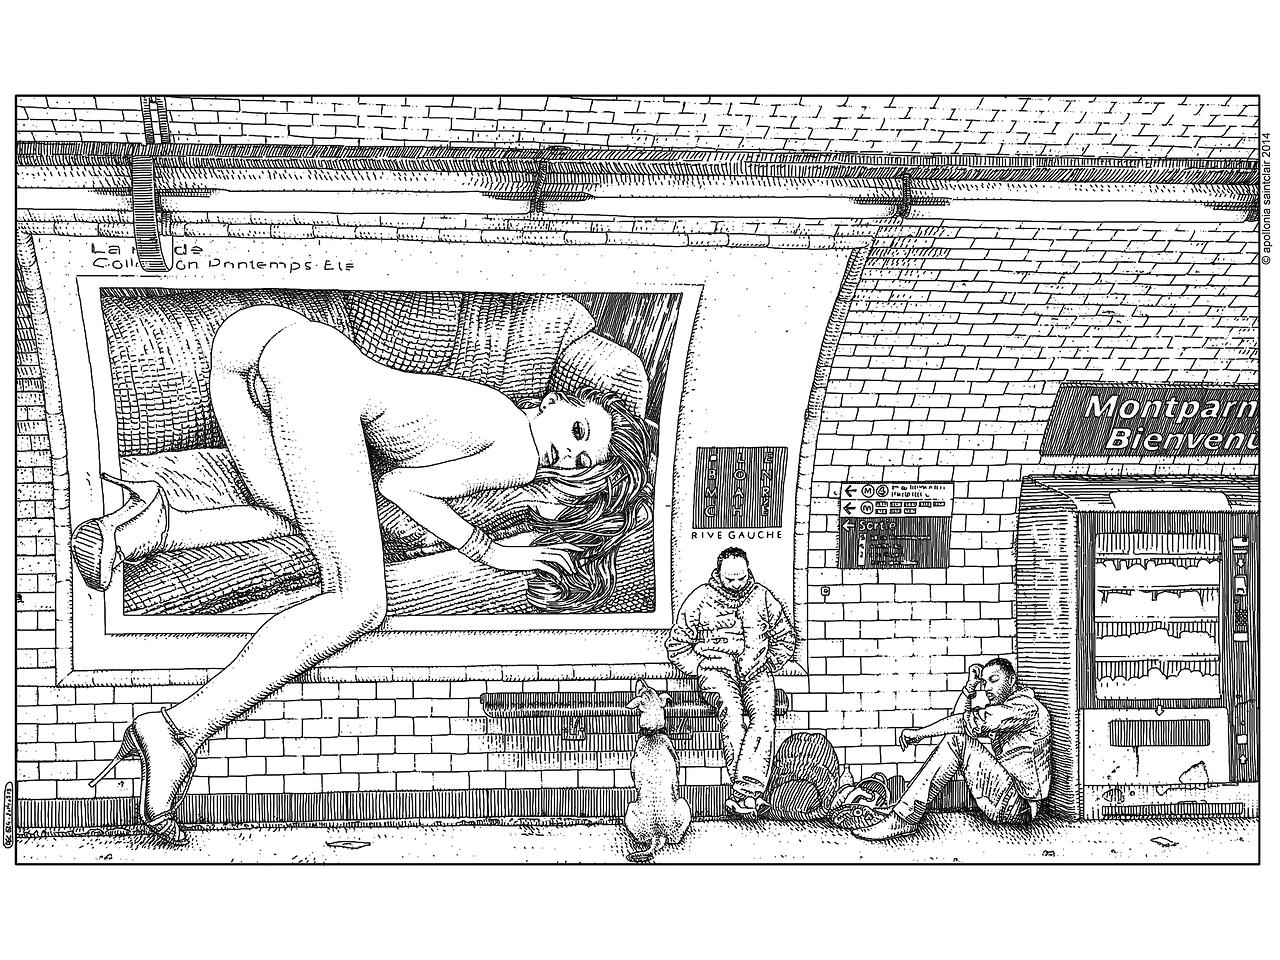 EBDLN-Apollonia-Saintclair-Erotica-4